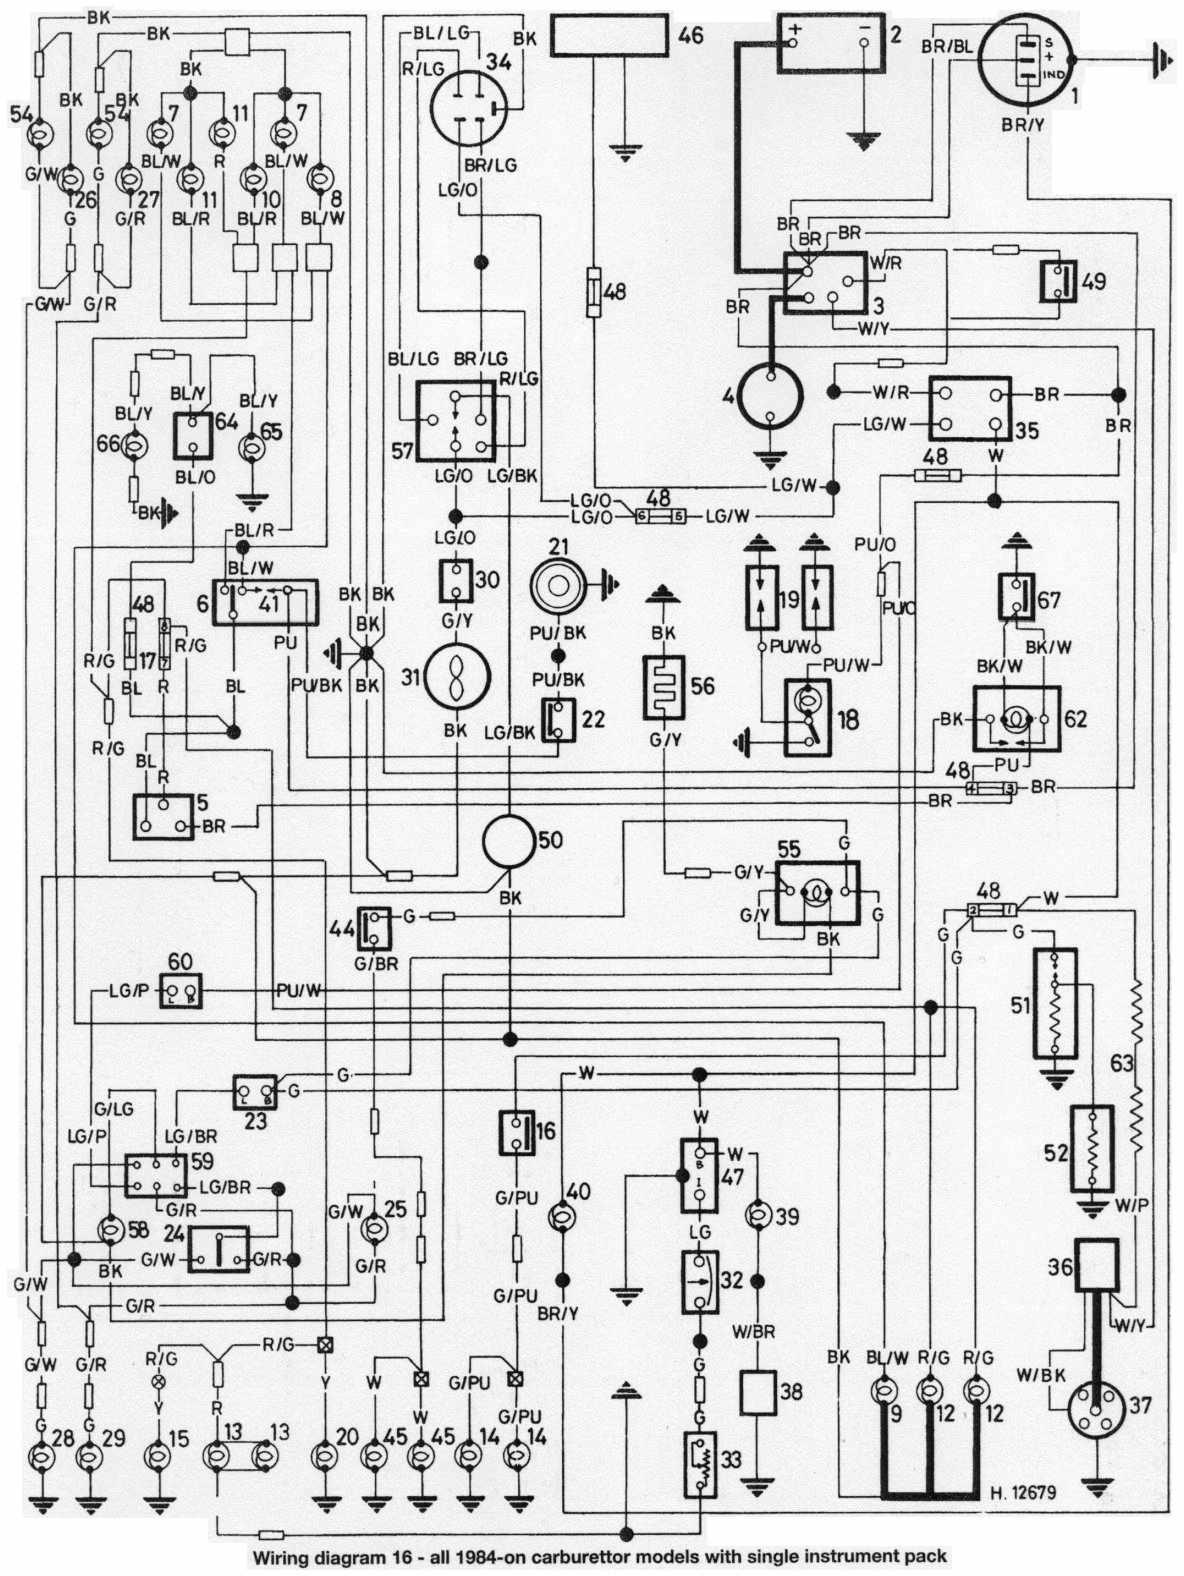 1967 mini wiring diagram wiring diagram todays rh 4 7 12 1813weddingbarn com 1967 vw wiring diagram 1967 ford wiring diagram [ 1184 x 1576 Pixel ]